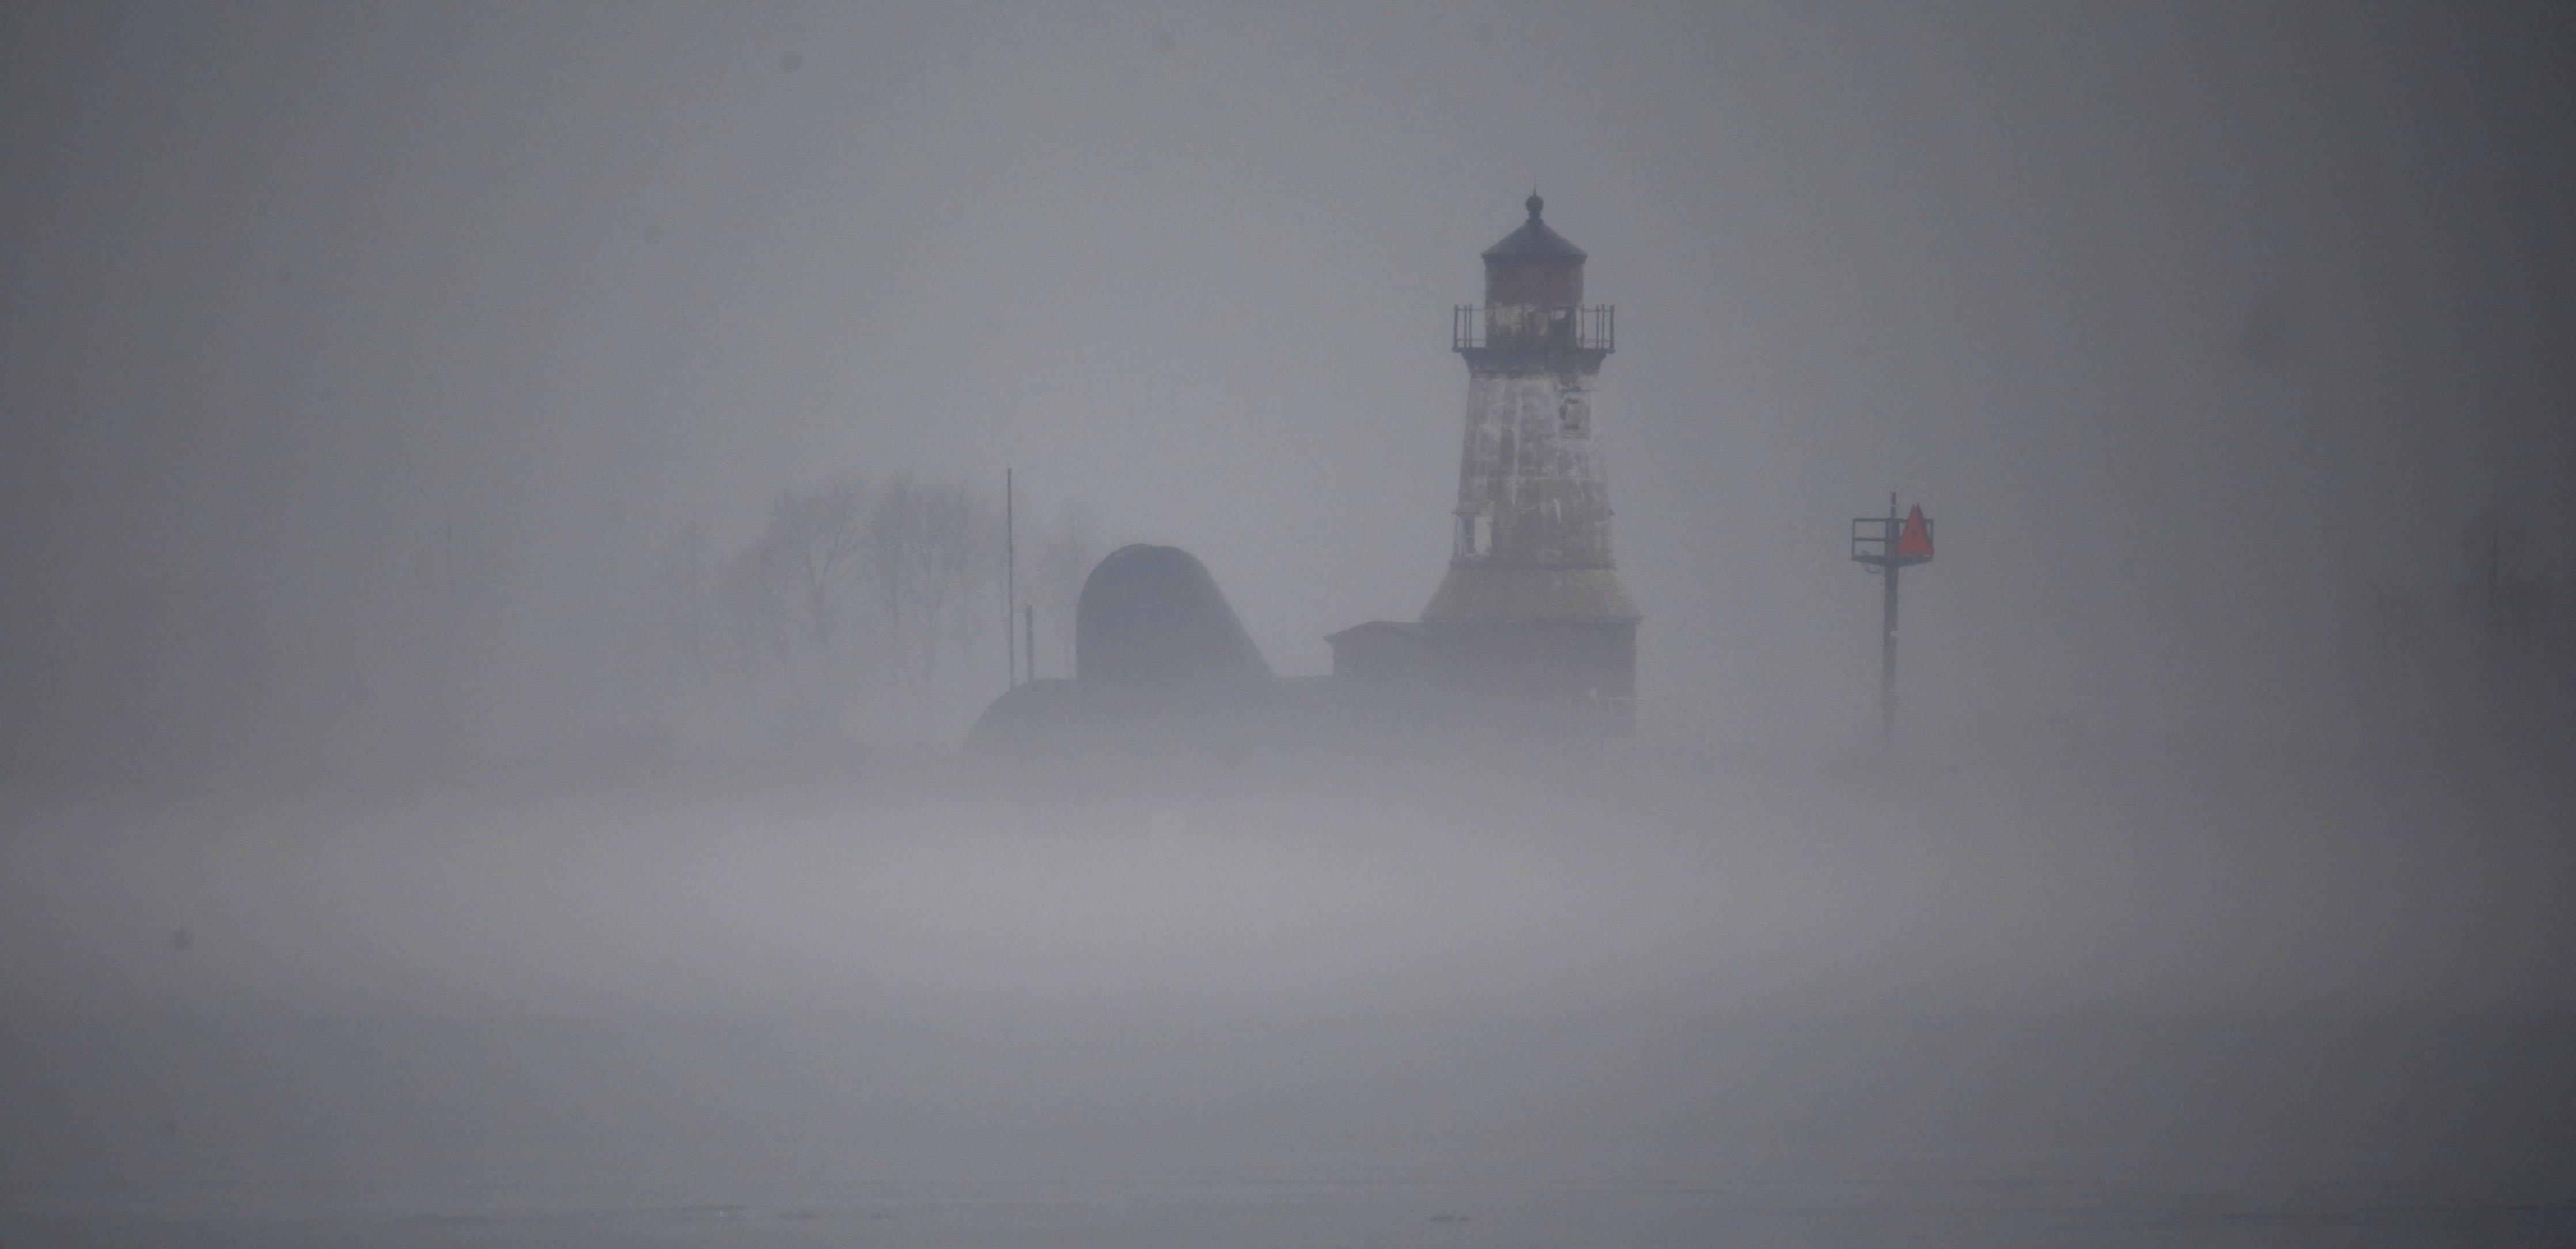 Rain and fog roll in along the Buffalo River on Tuesday, Jan. 17, 2017. (Harry Scull Jr./Buffalo News)